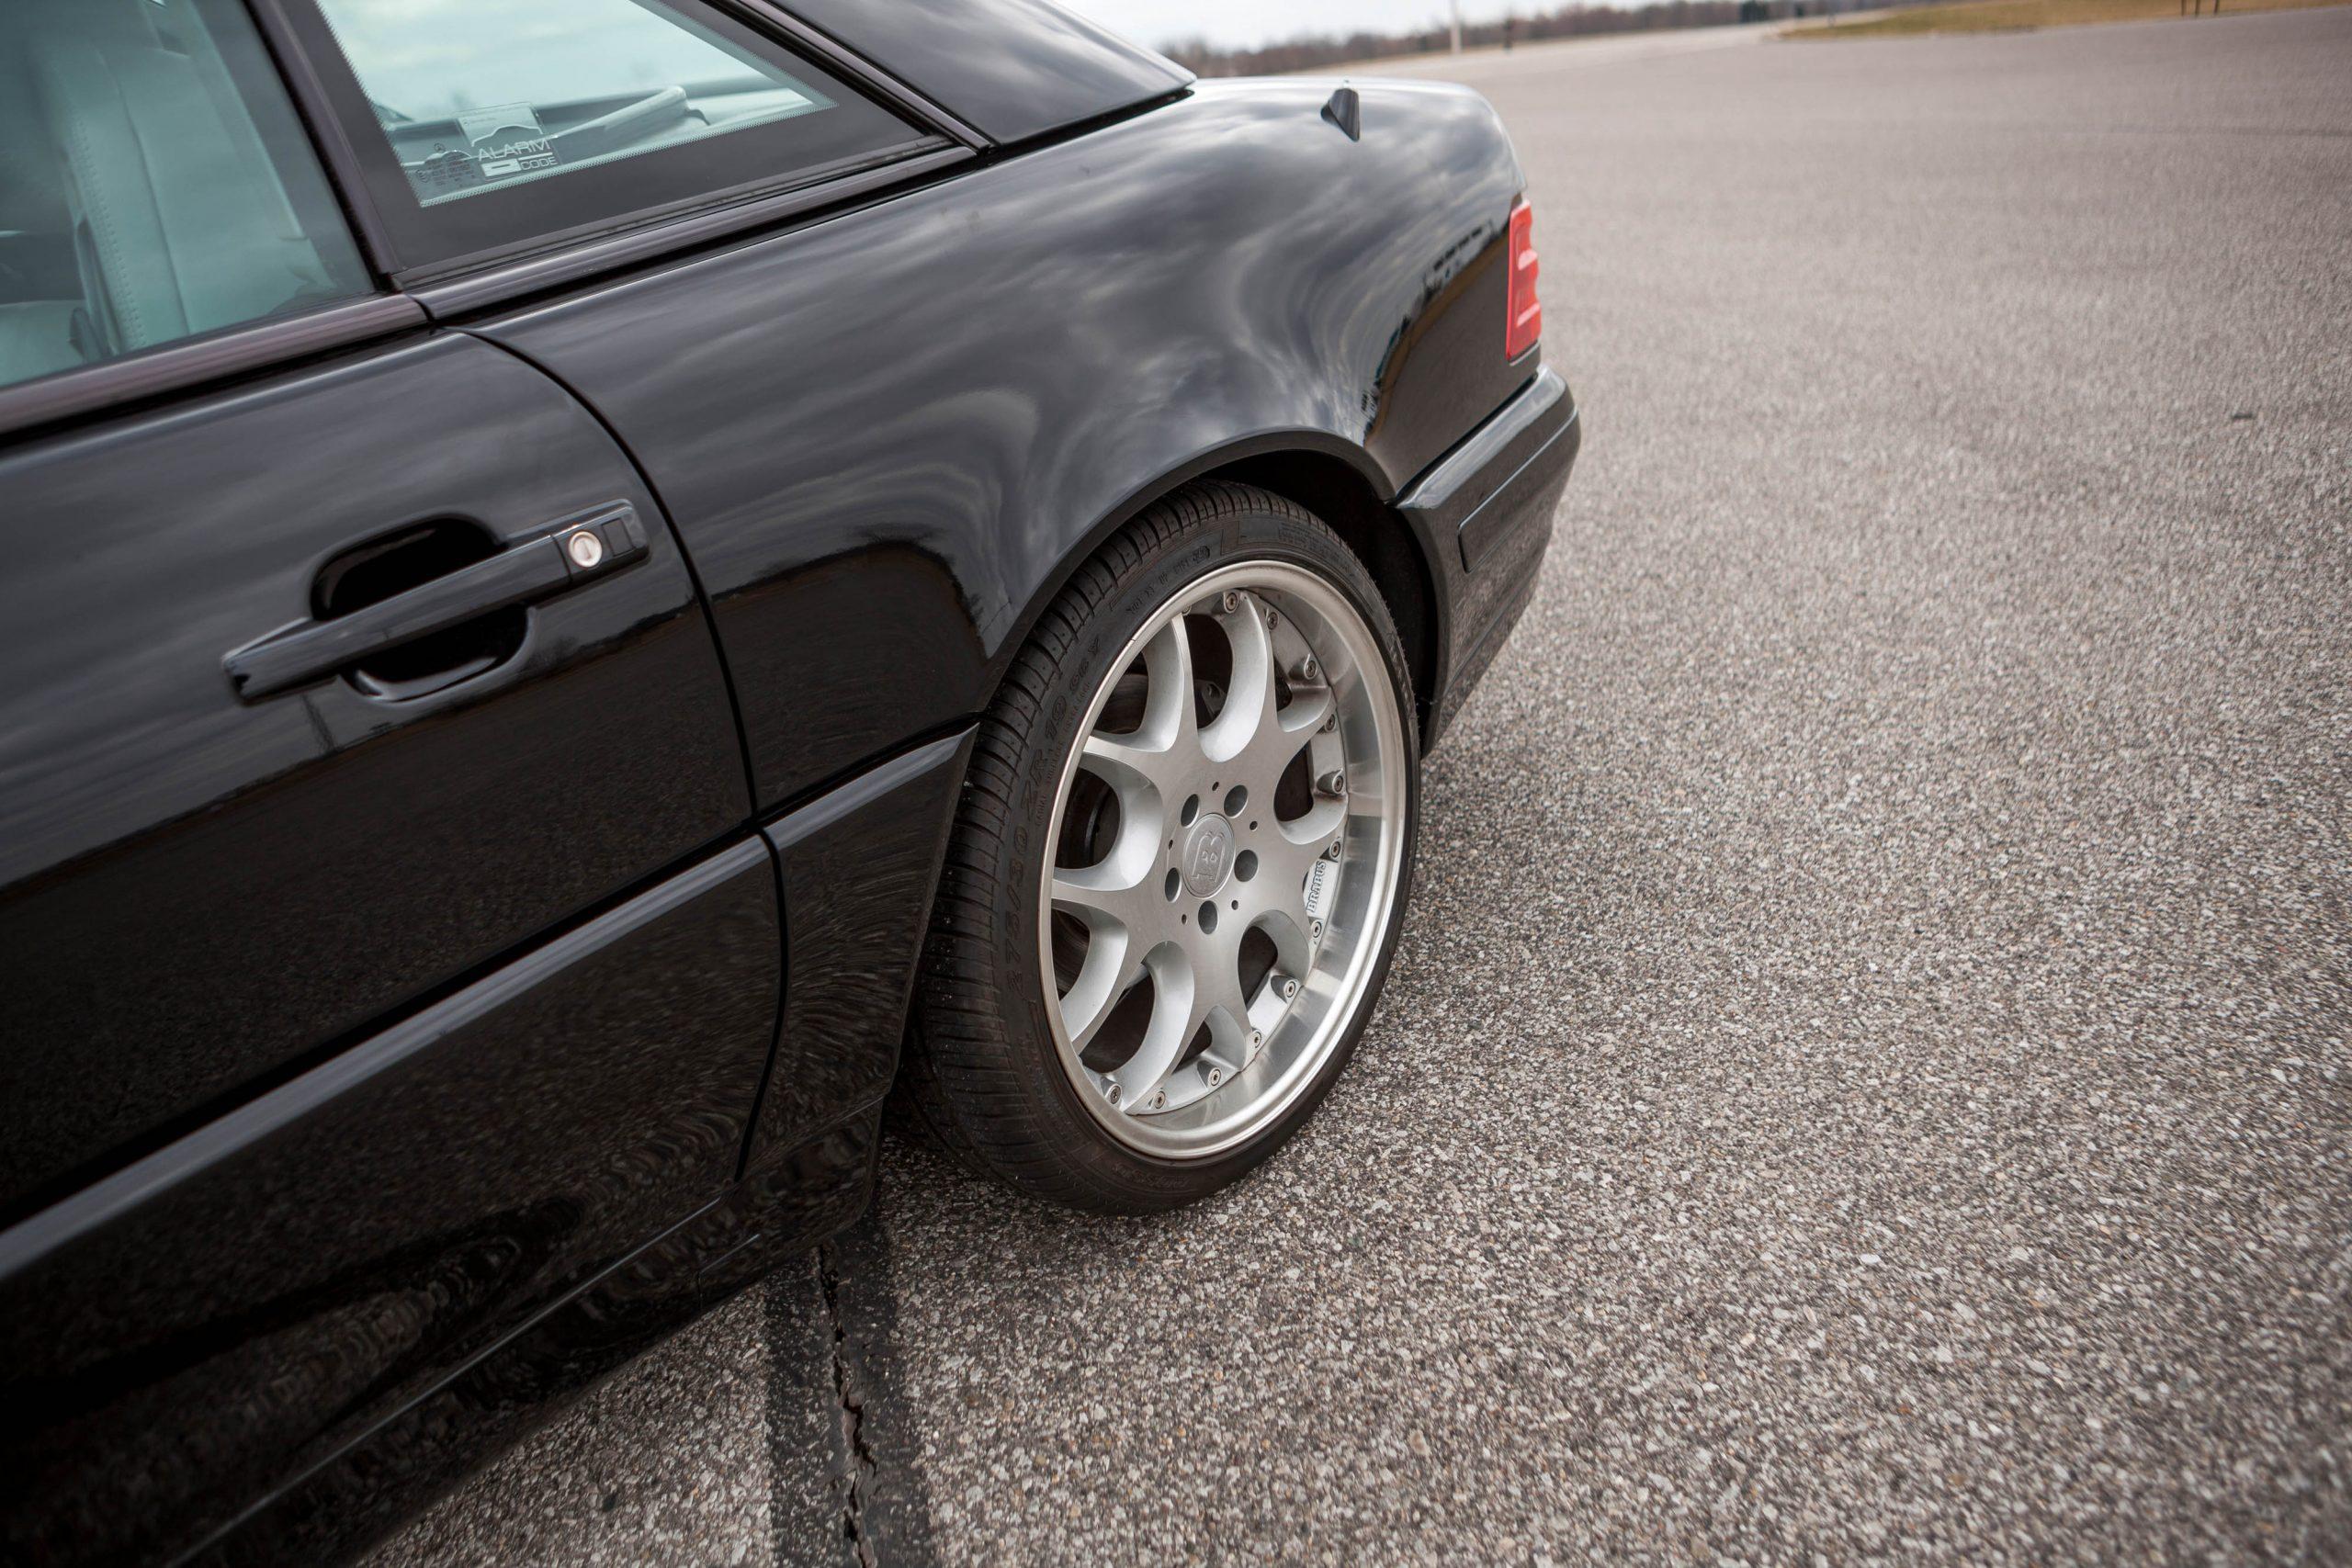 1999 Mercedes-Benz Brabus 7.3 S rear wheel